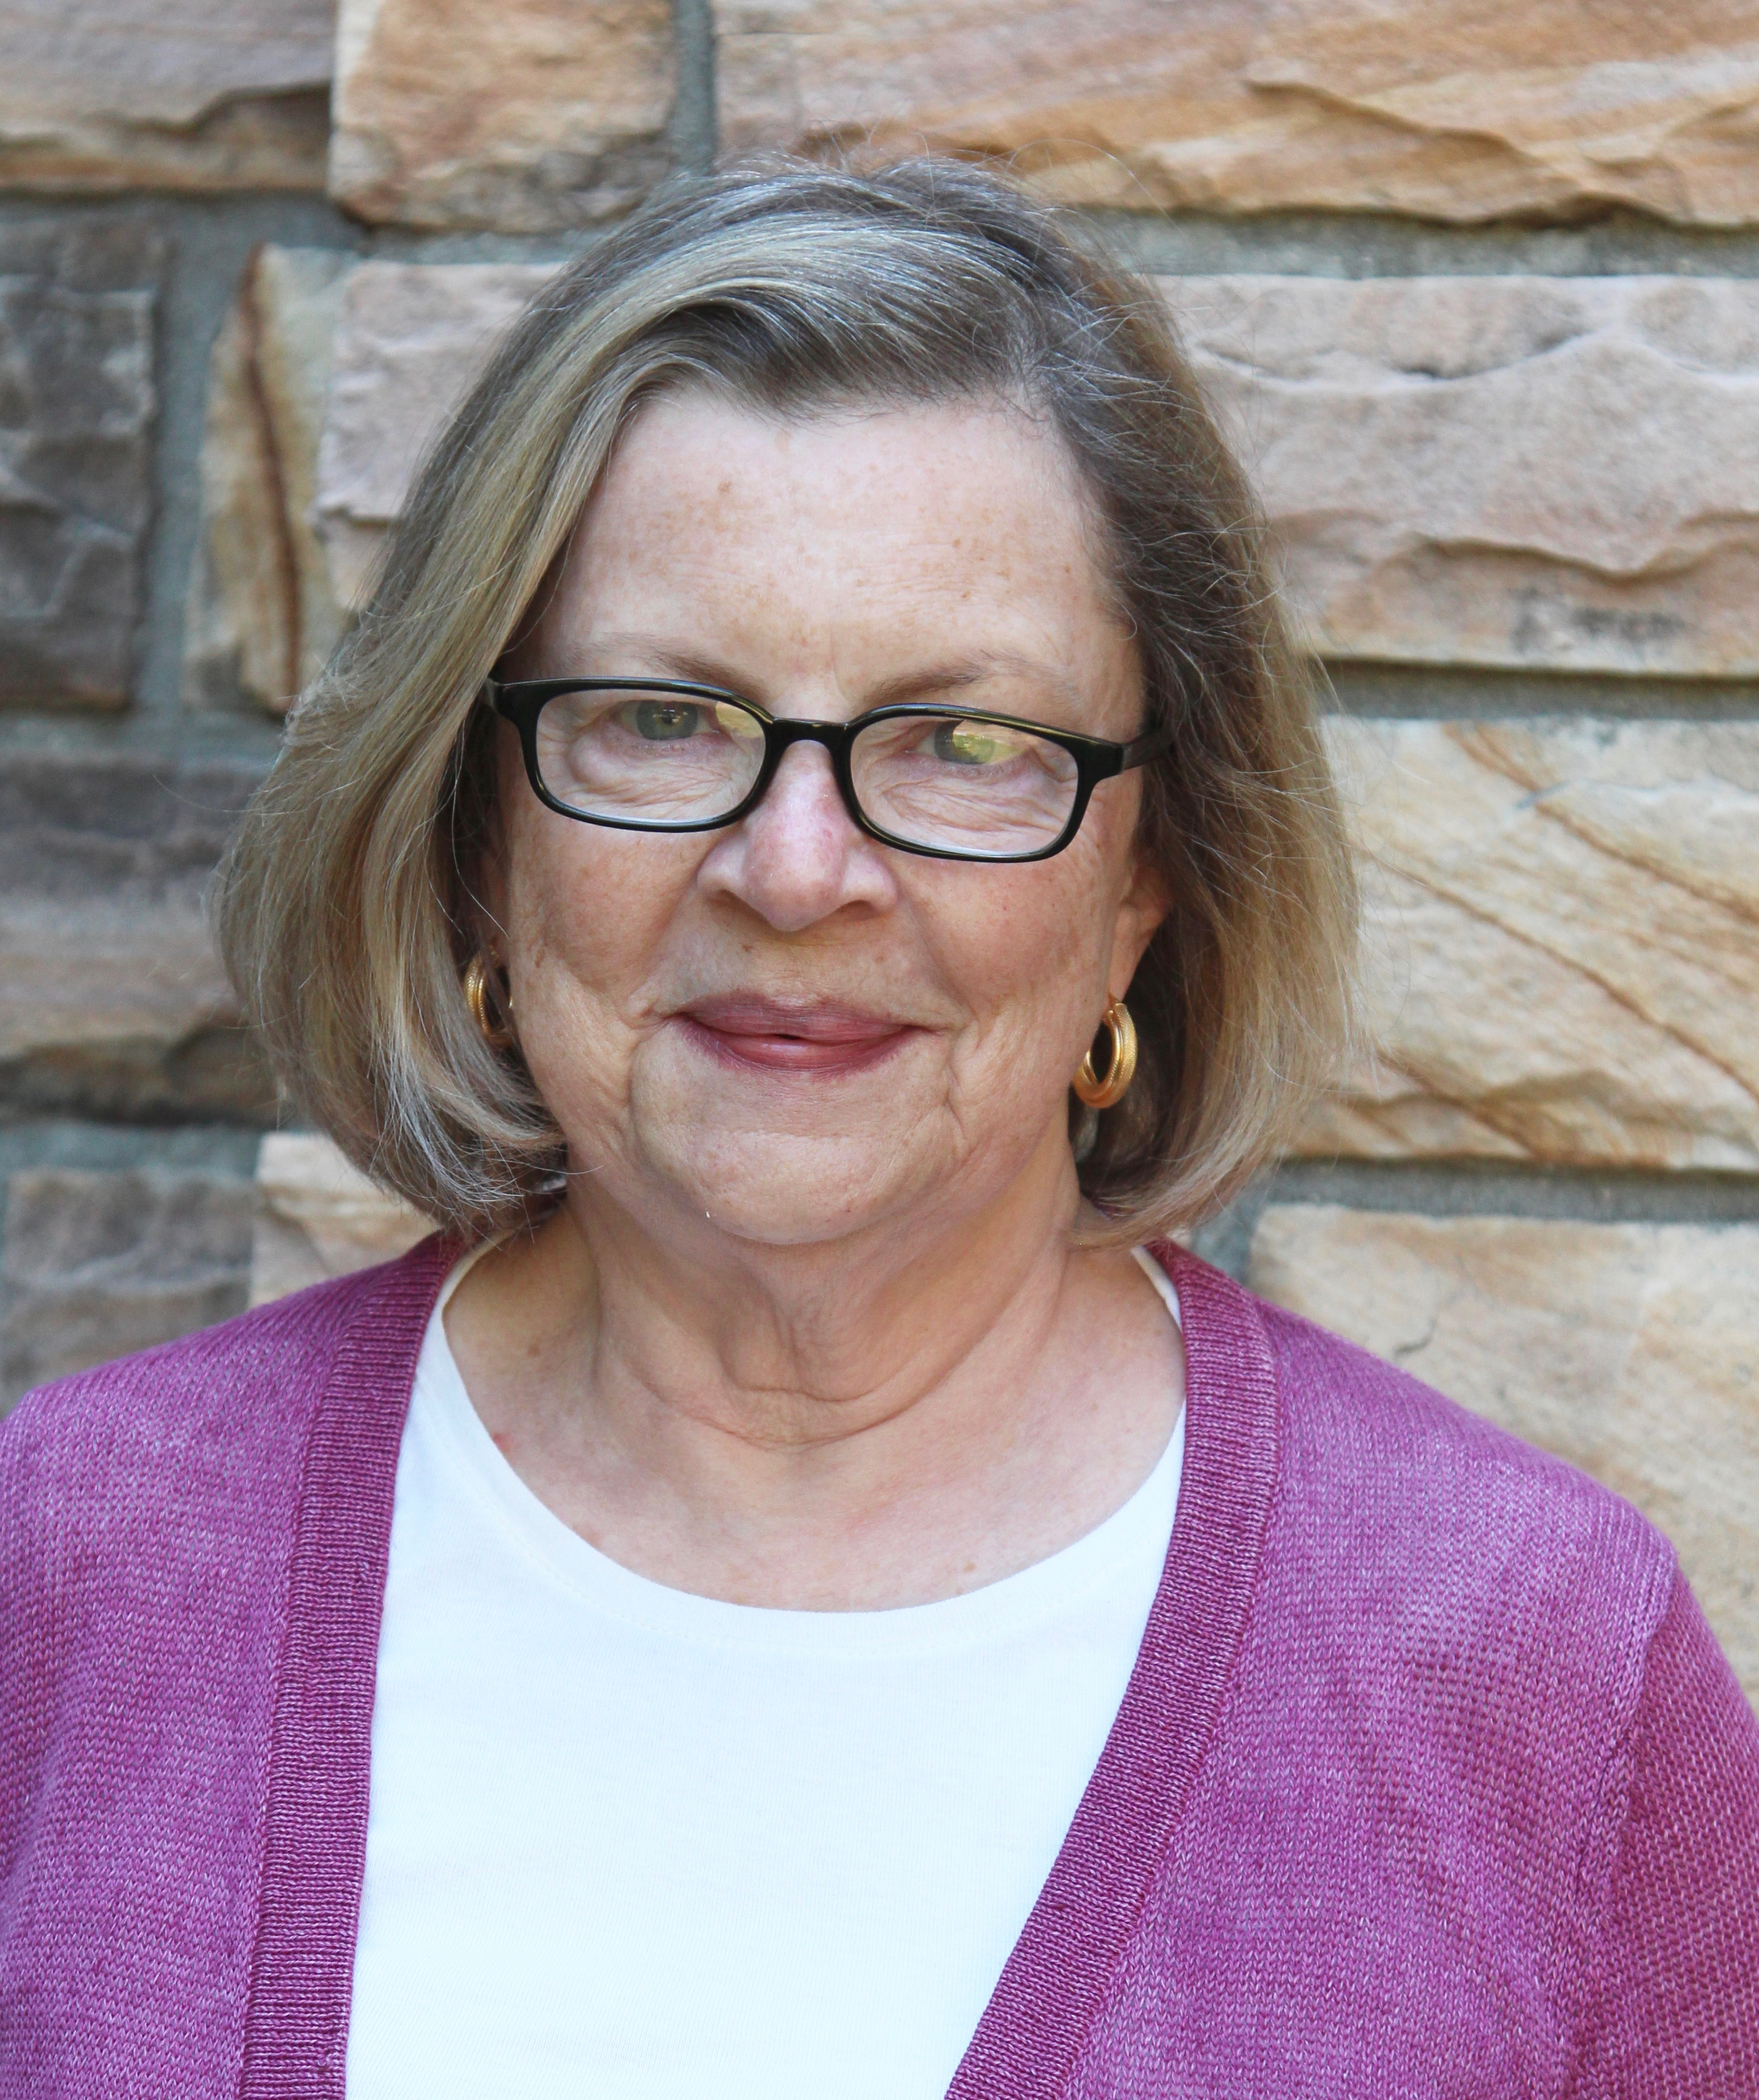 Evelyn Puckett